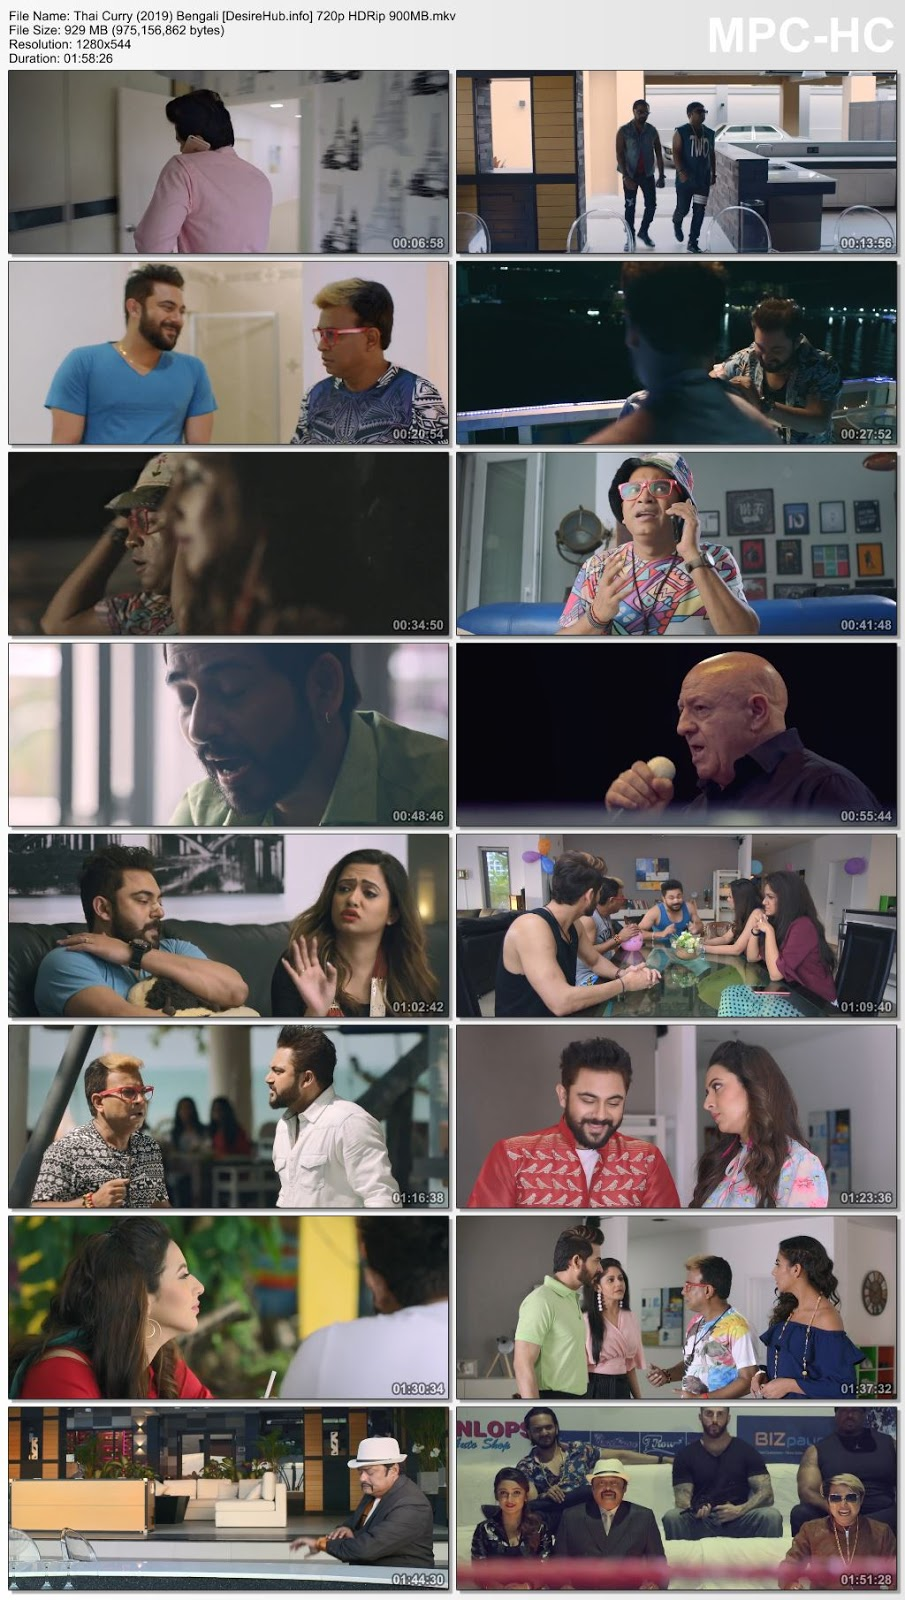 Thai Curry (2019) Bengali 720p HDRip 900MB Desirehub